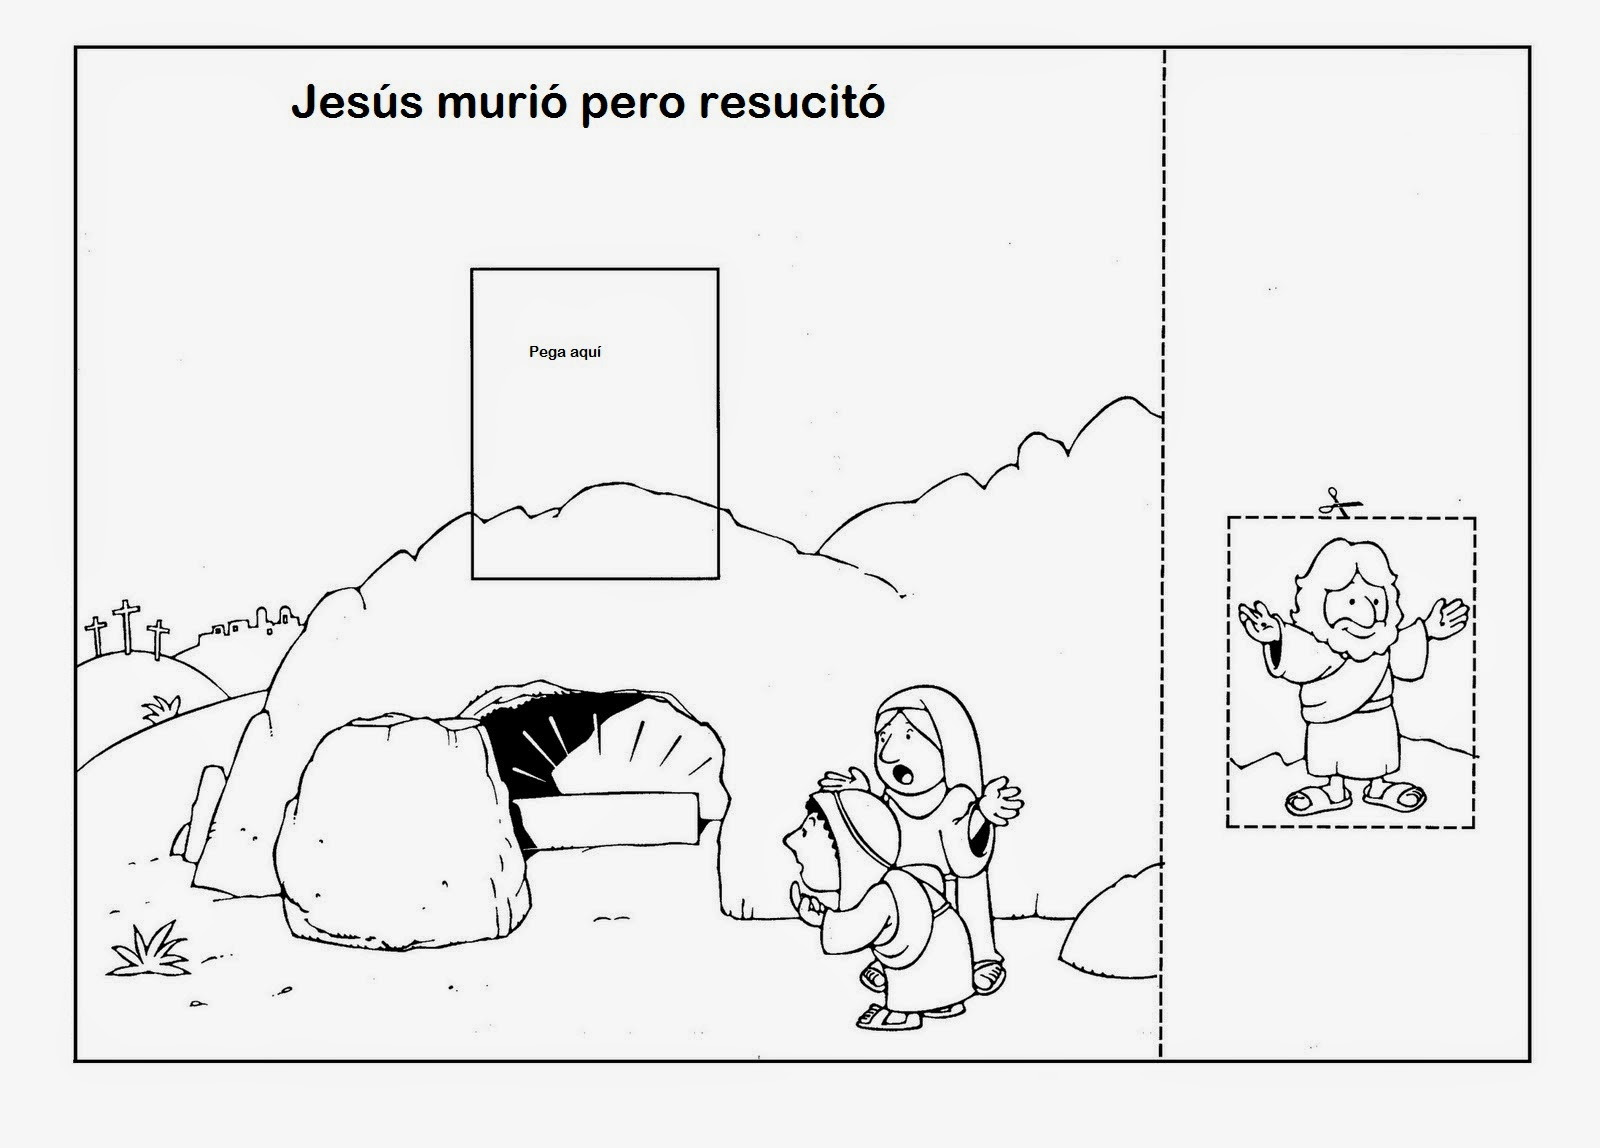 La Pizarra de Clase: ¡Feliz Pascua!